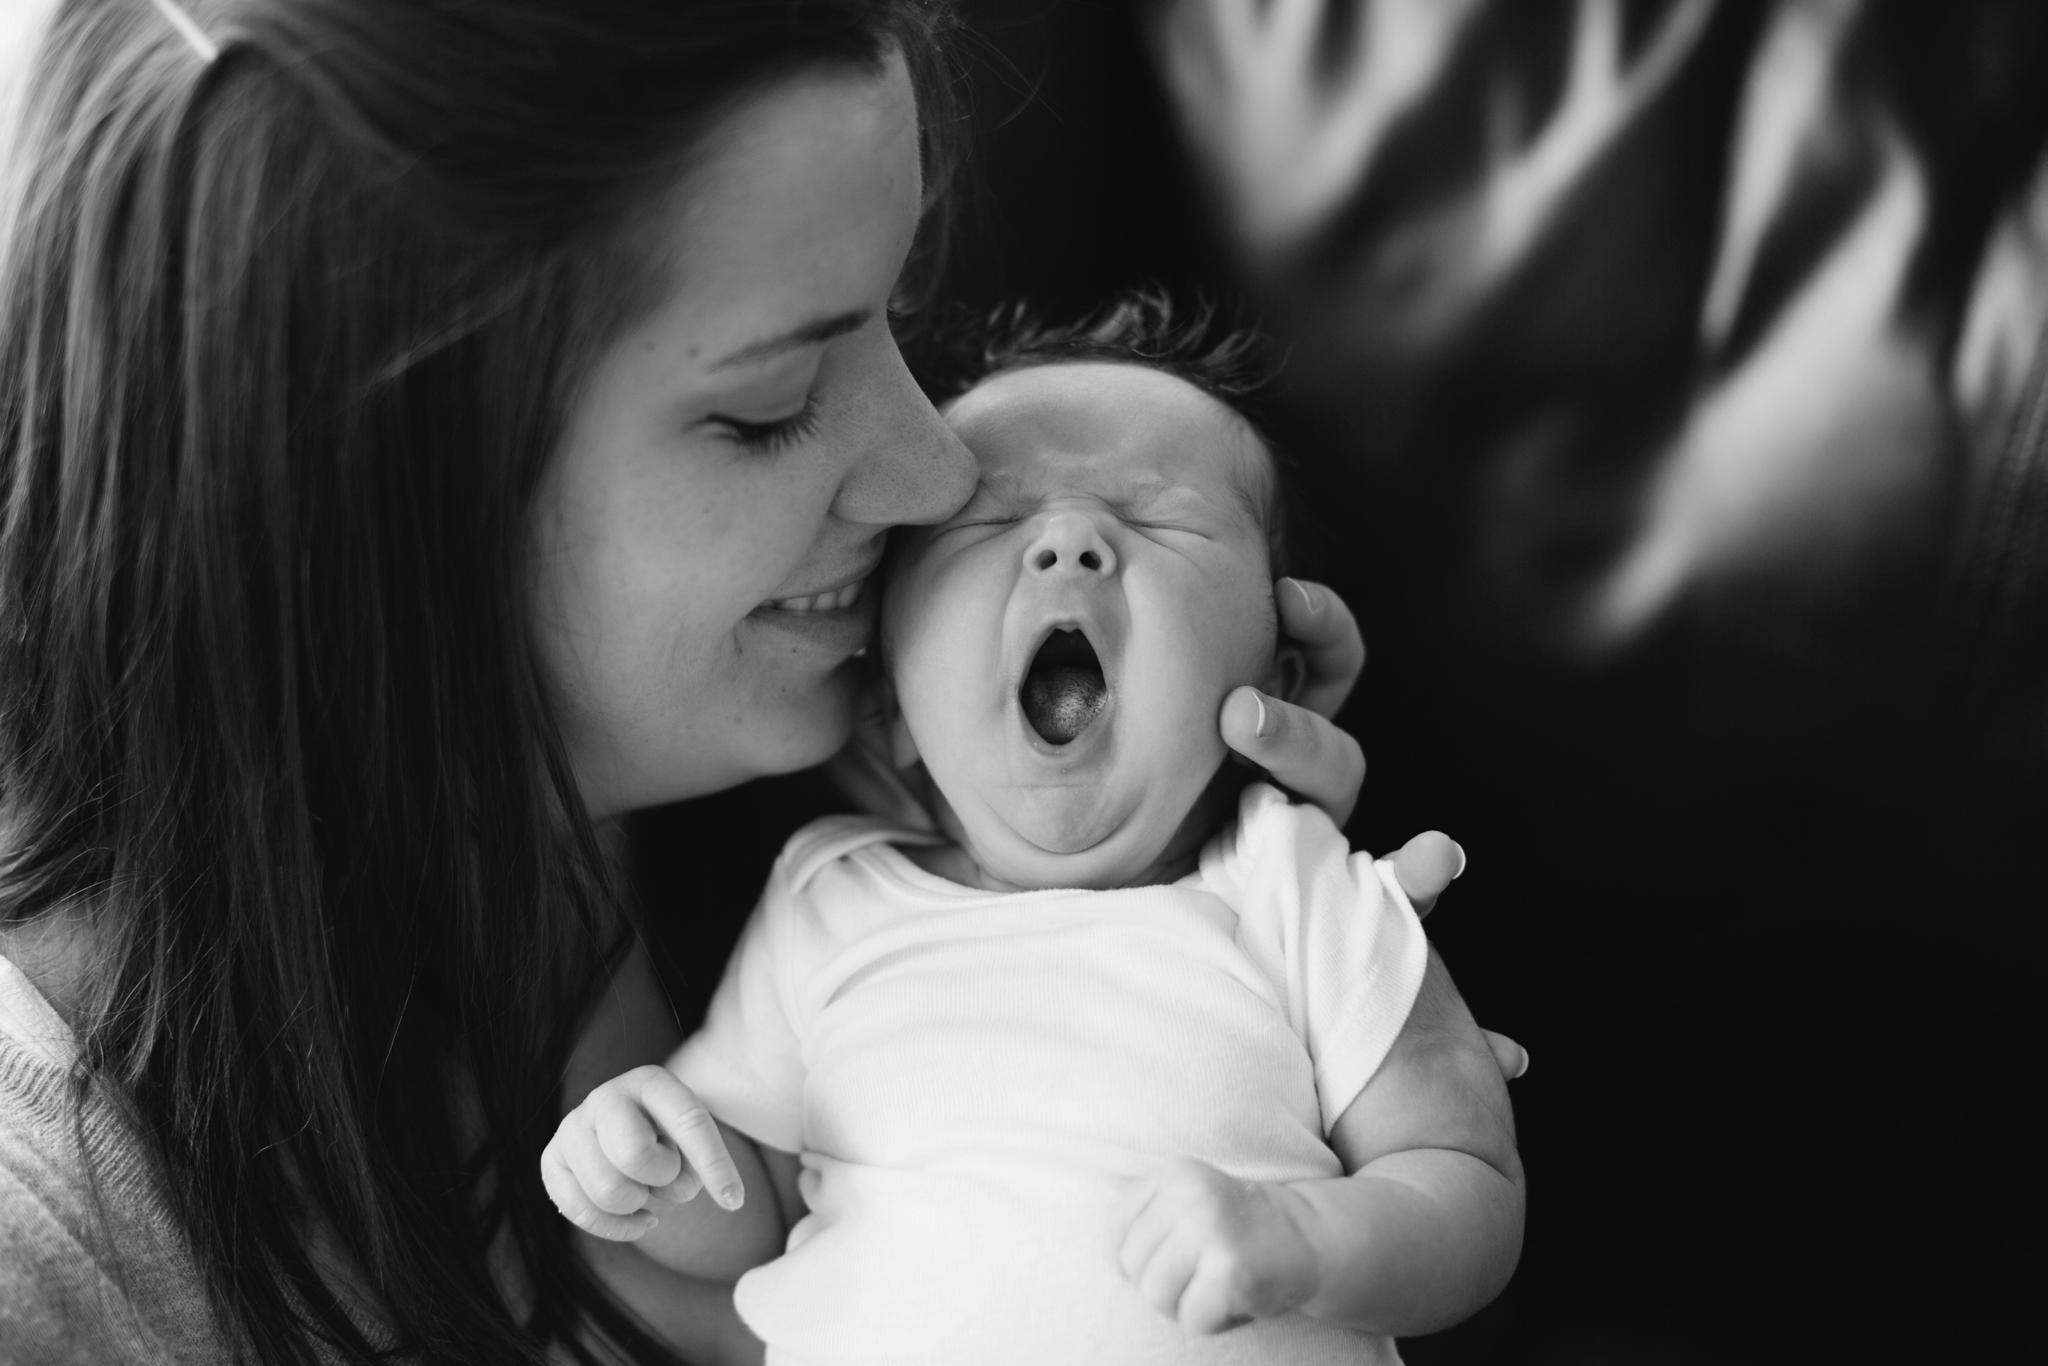 tunkhannock_scranton_pa_newborn_photographer_8950.jpg